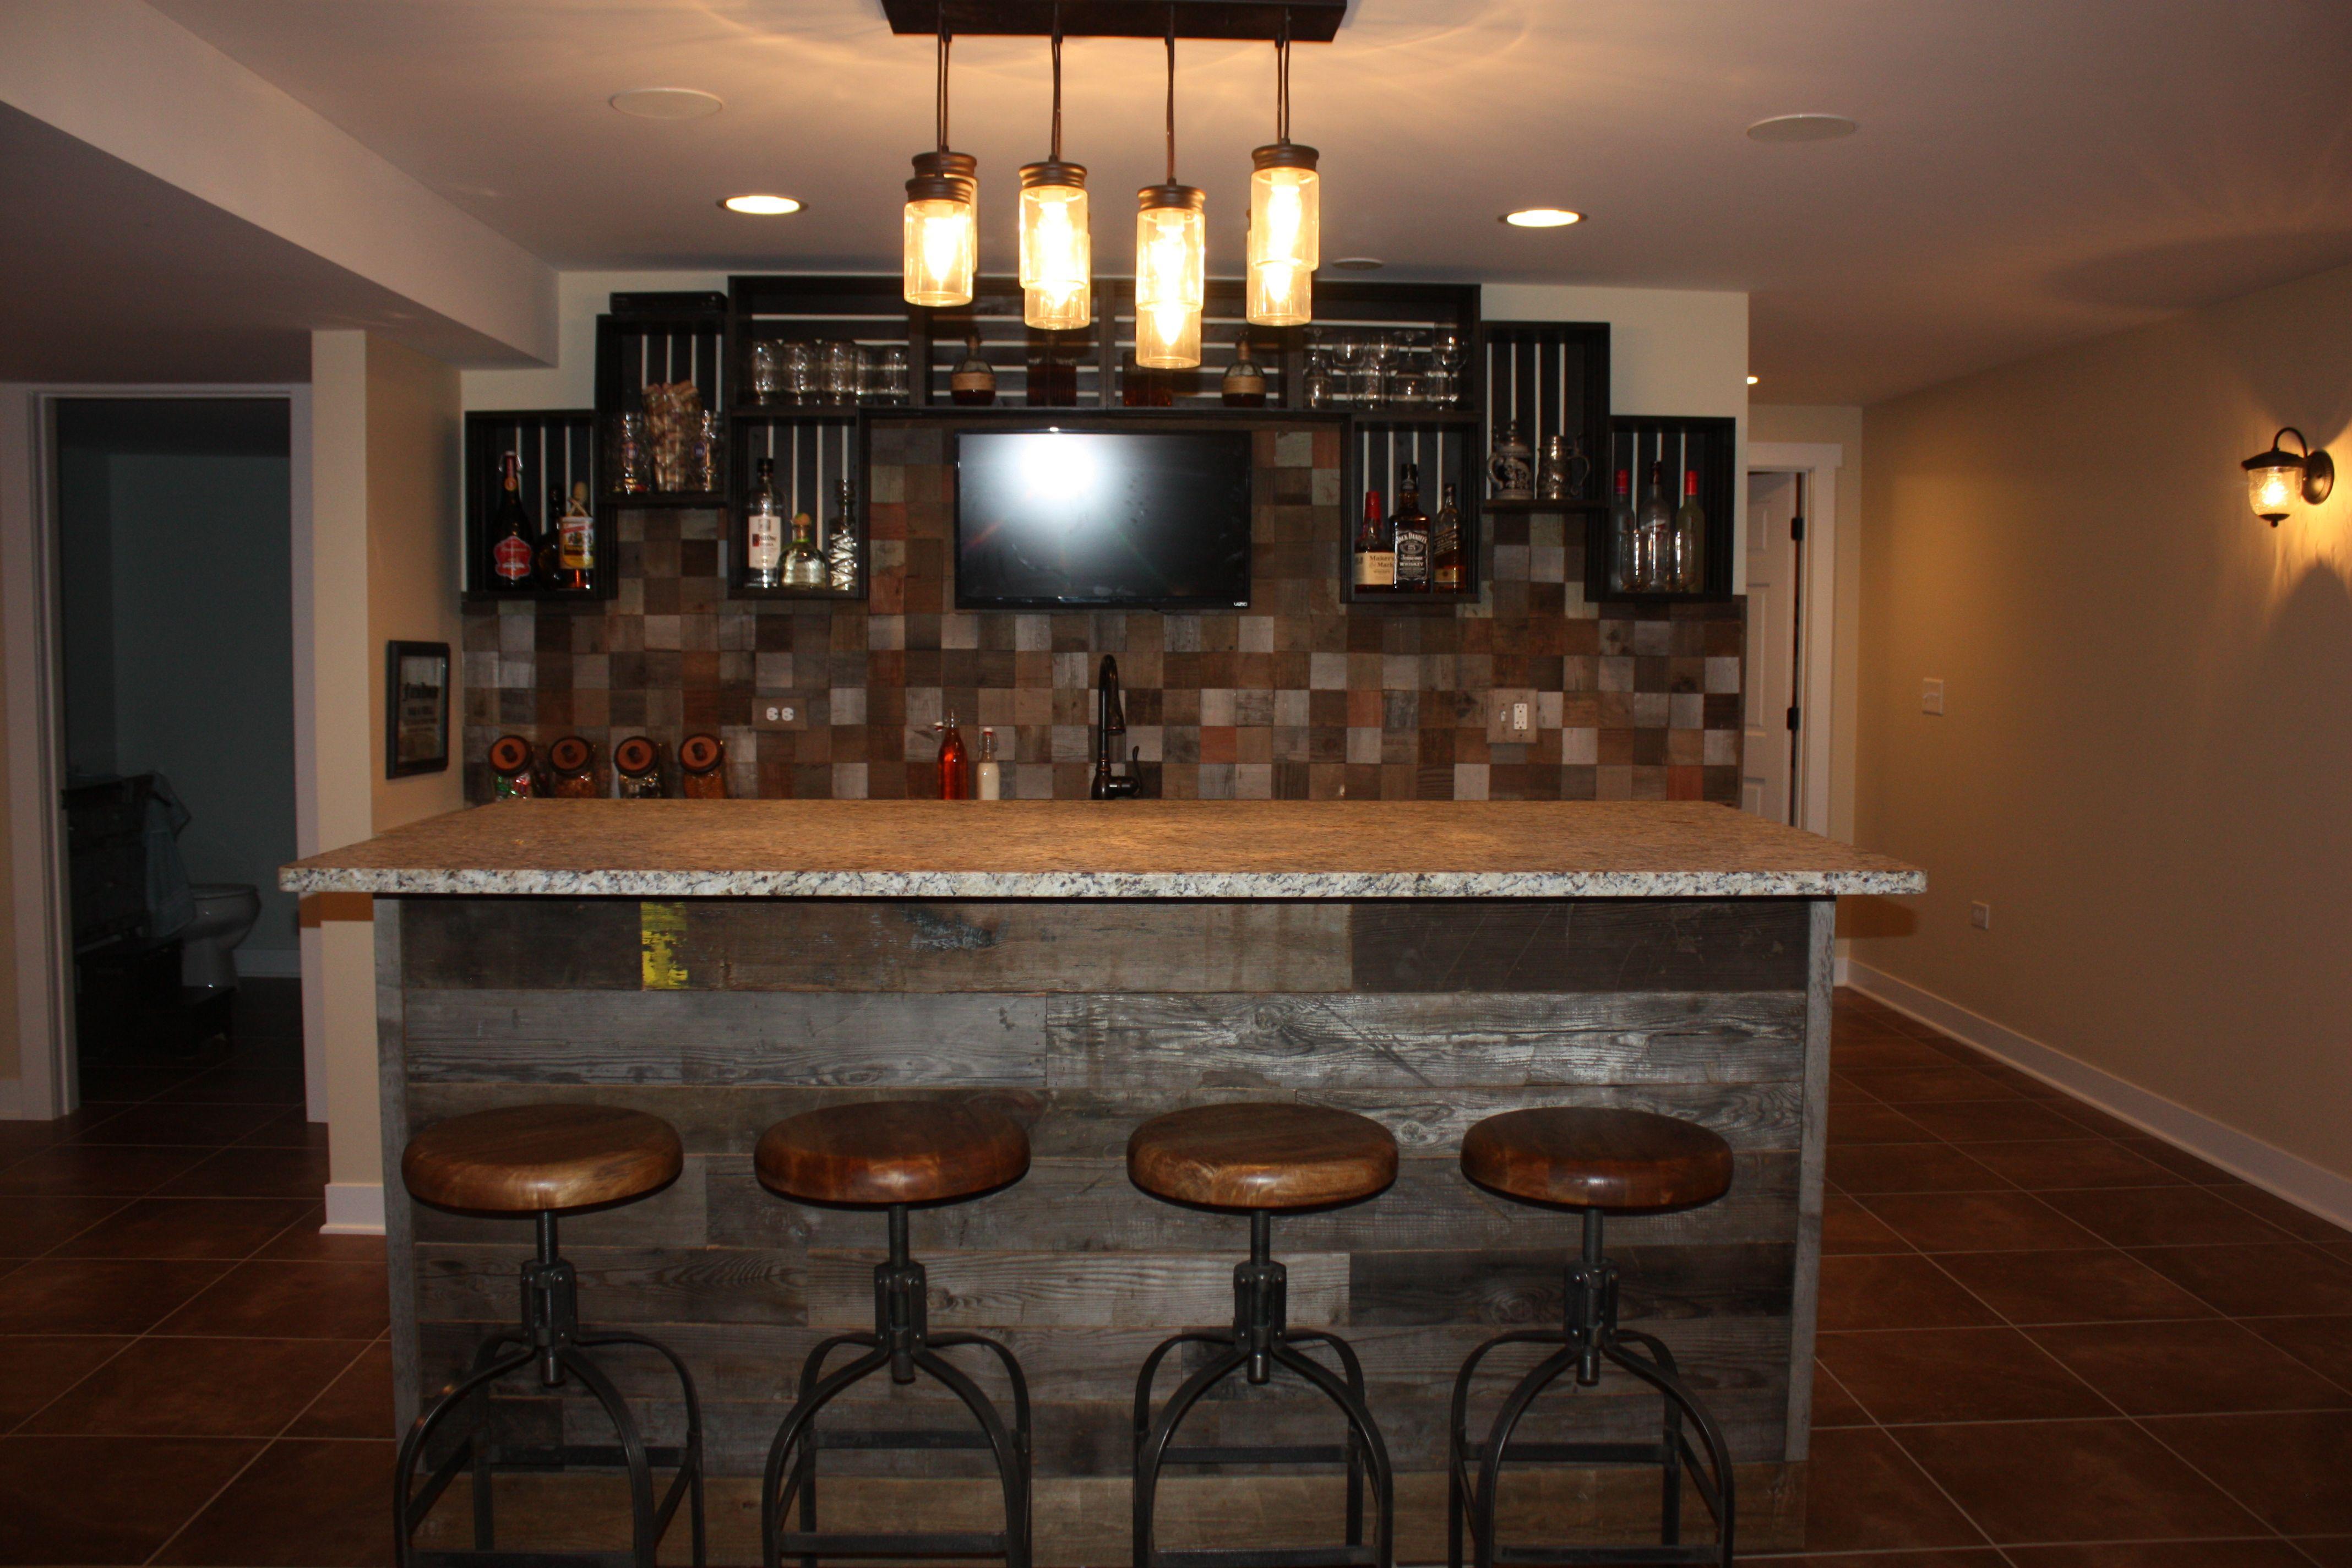 Basement Bar Reclaimed Wood Backsplash And Bar Front